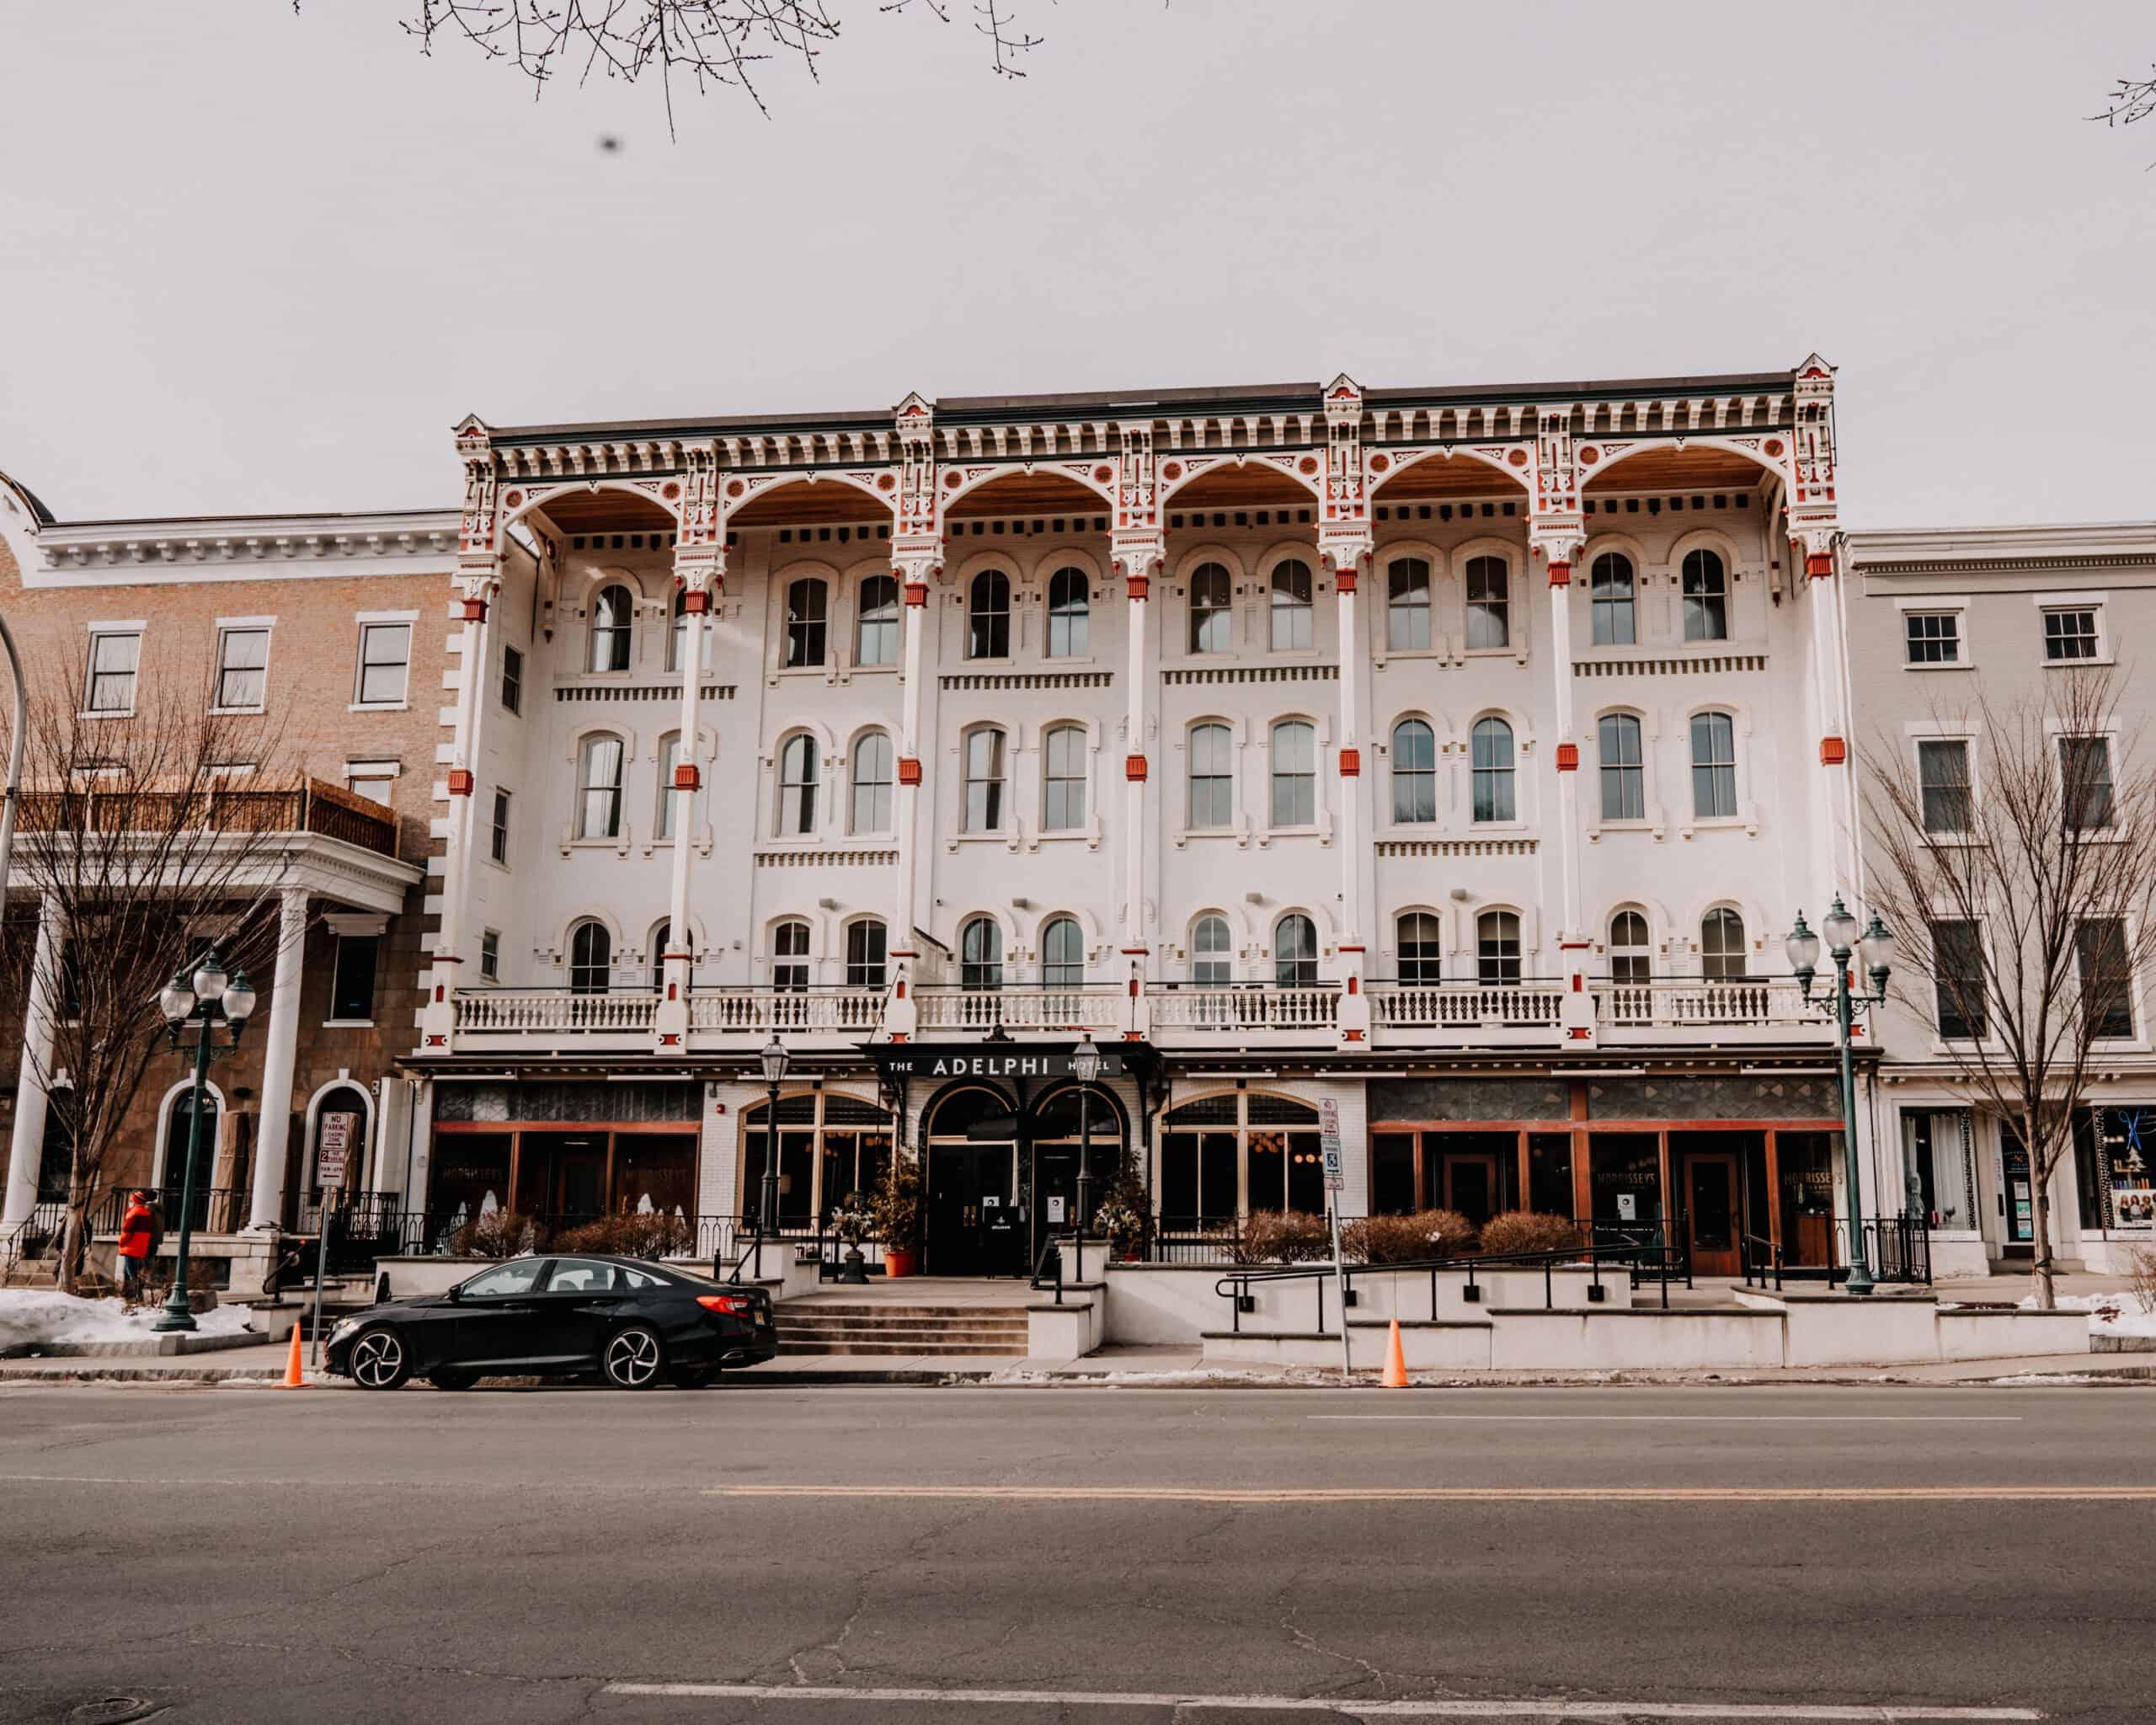 Adelphi Hotel Saratoga